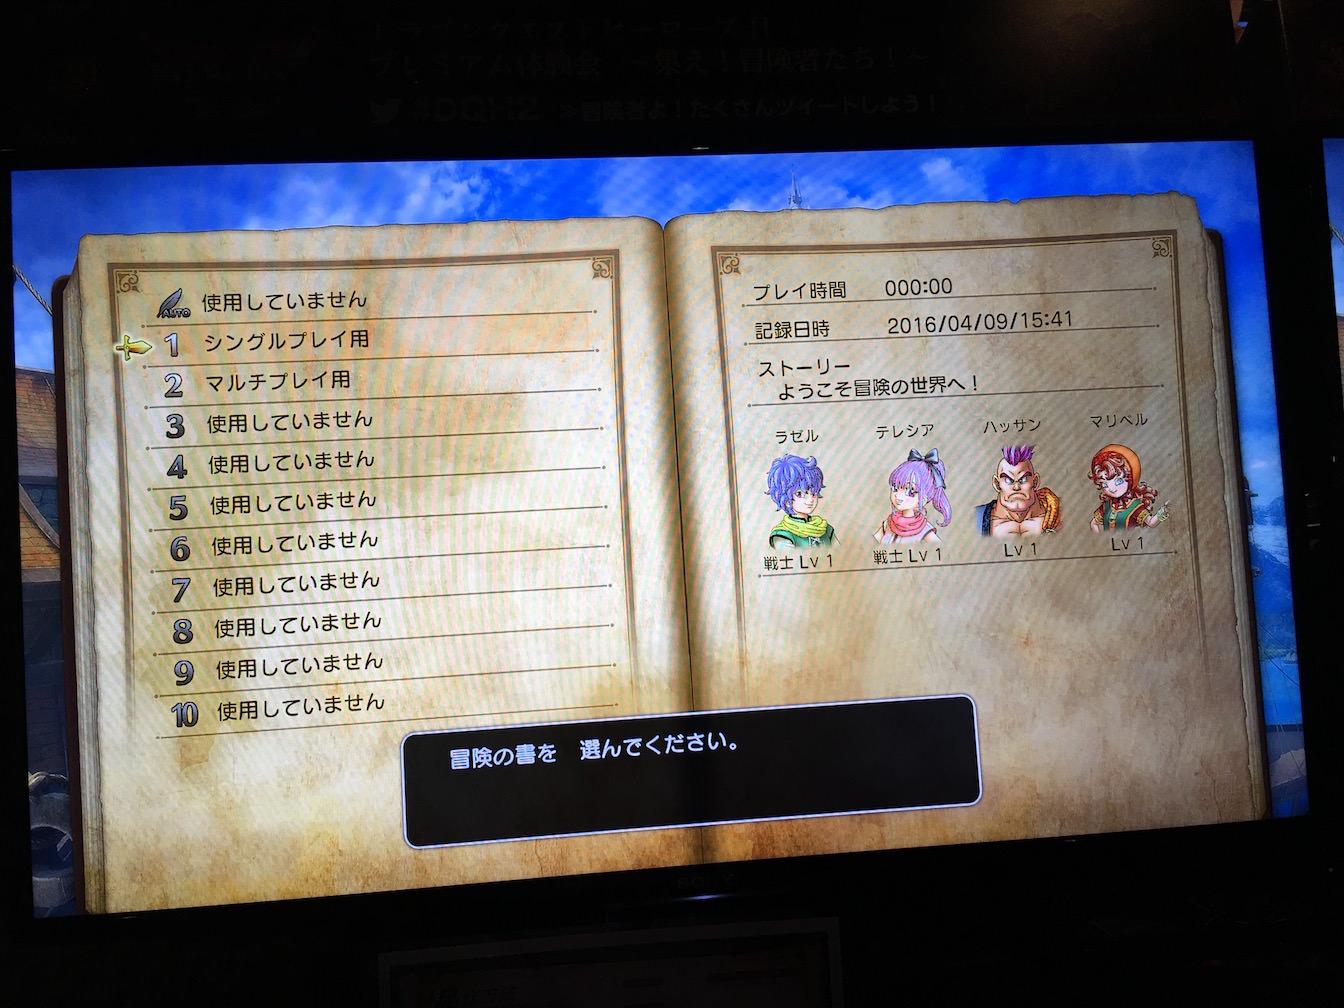 Dragon quest heros 2 premium experience meeting report 19